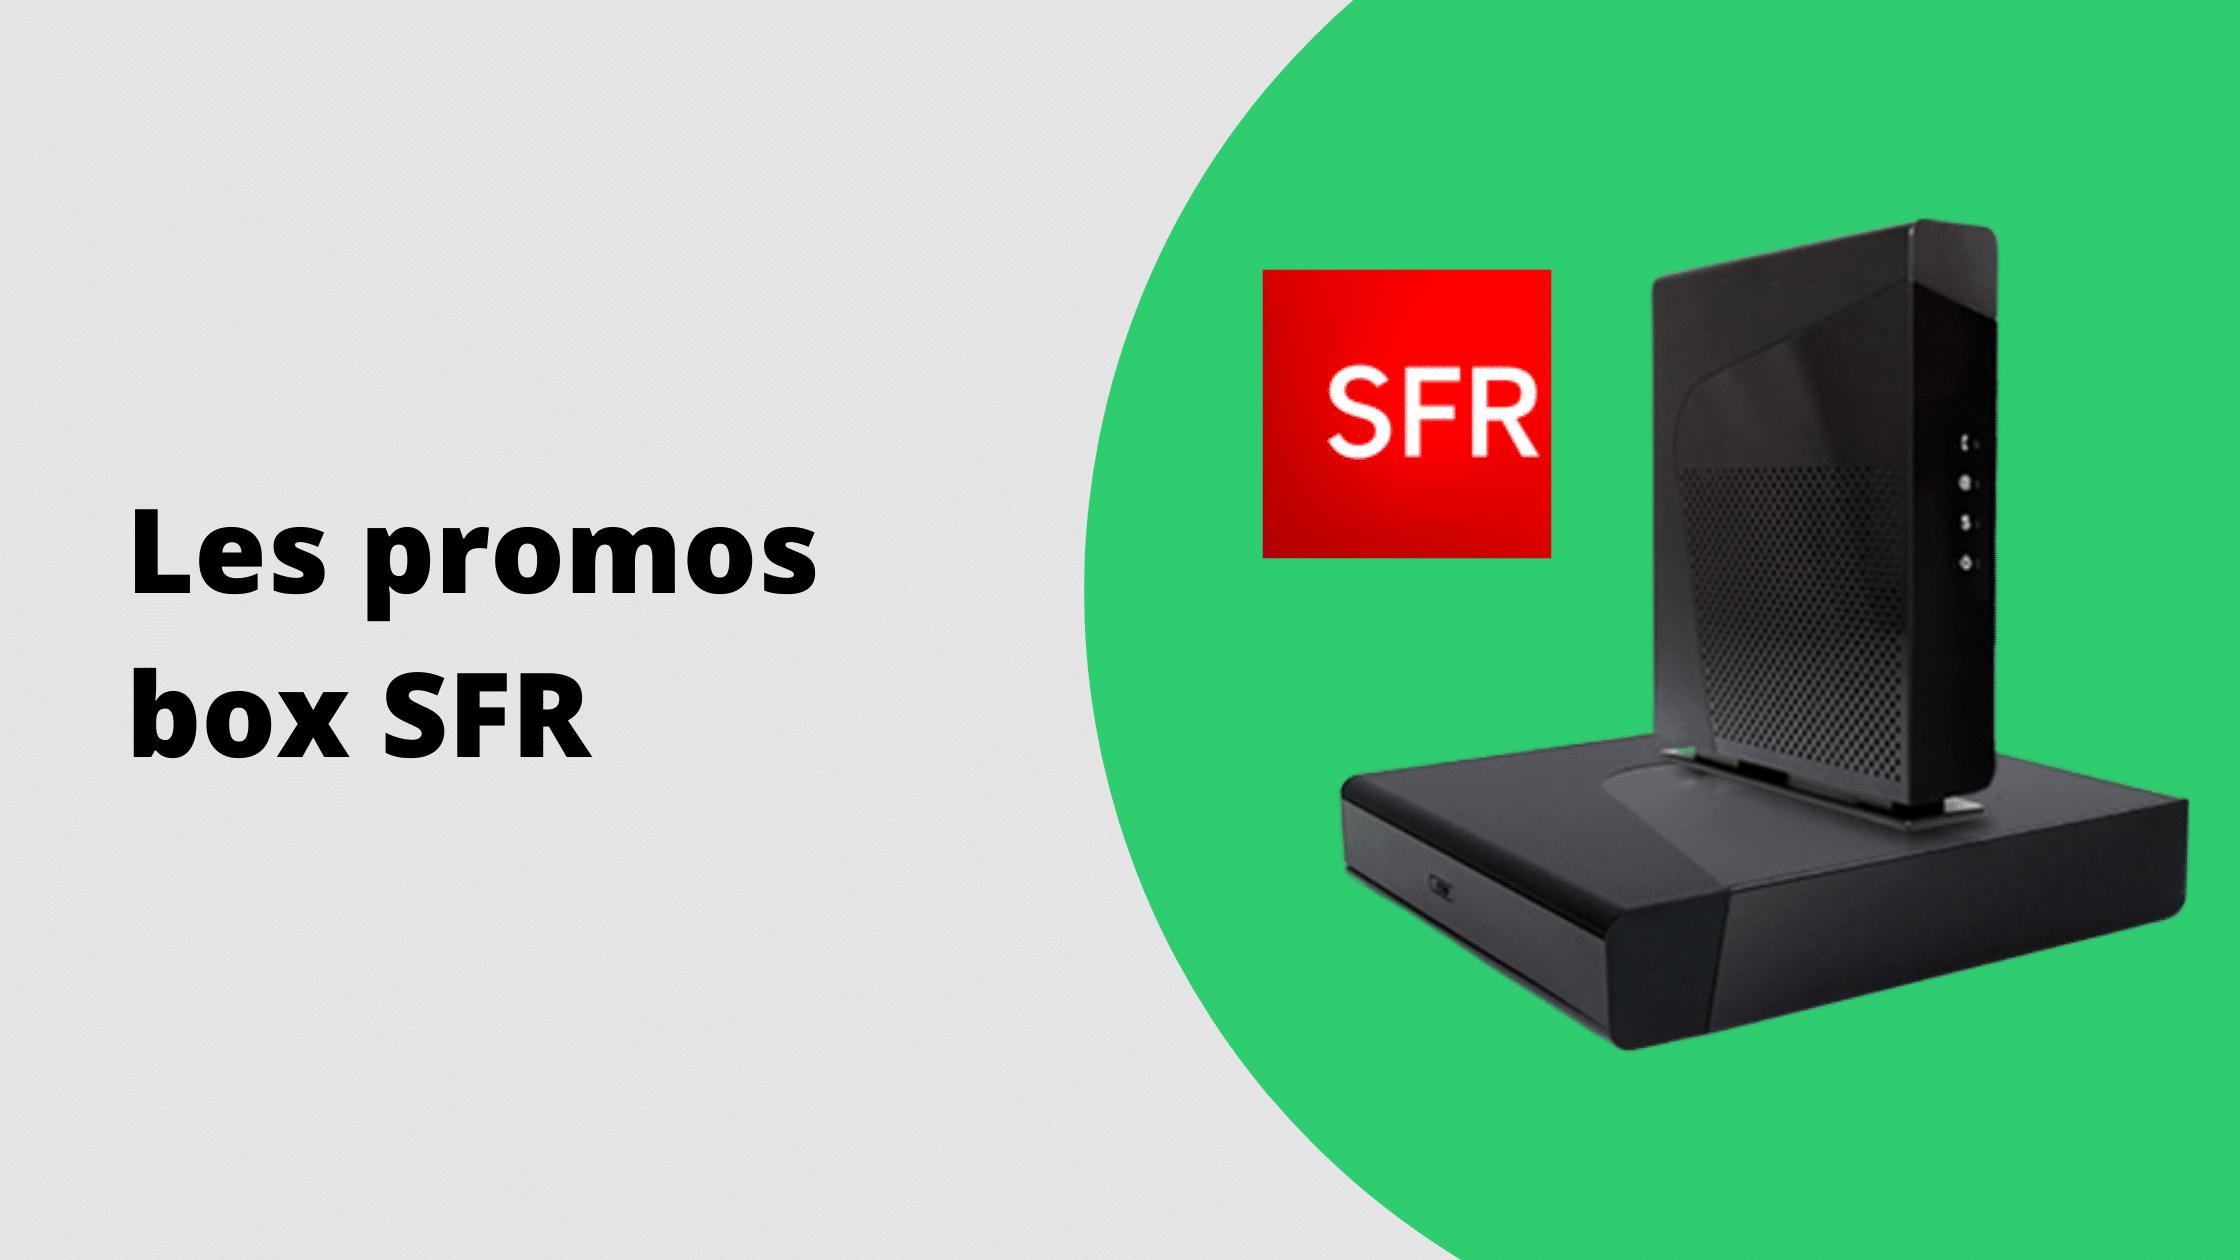 Promos box SFR